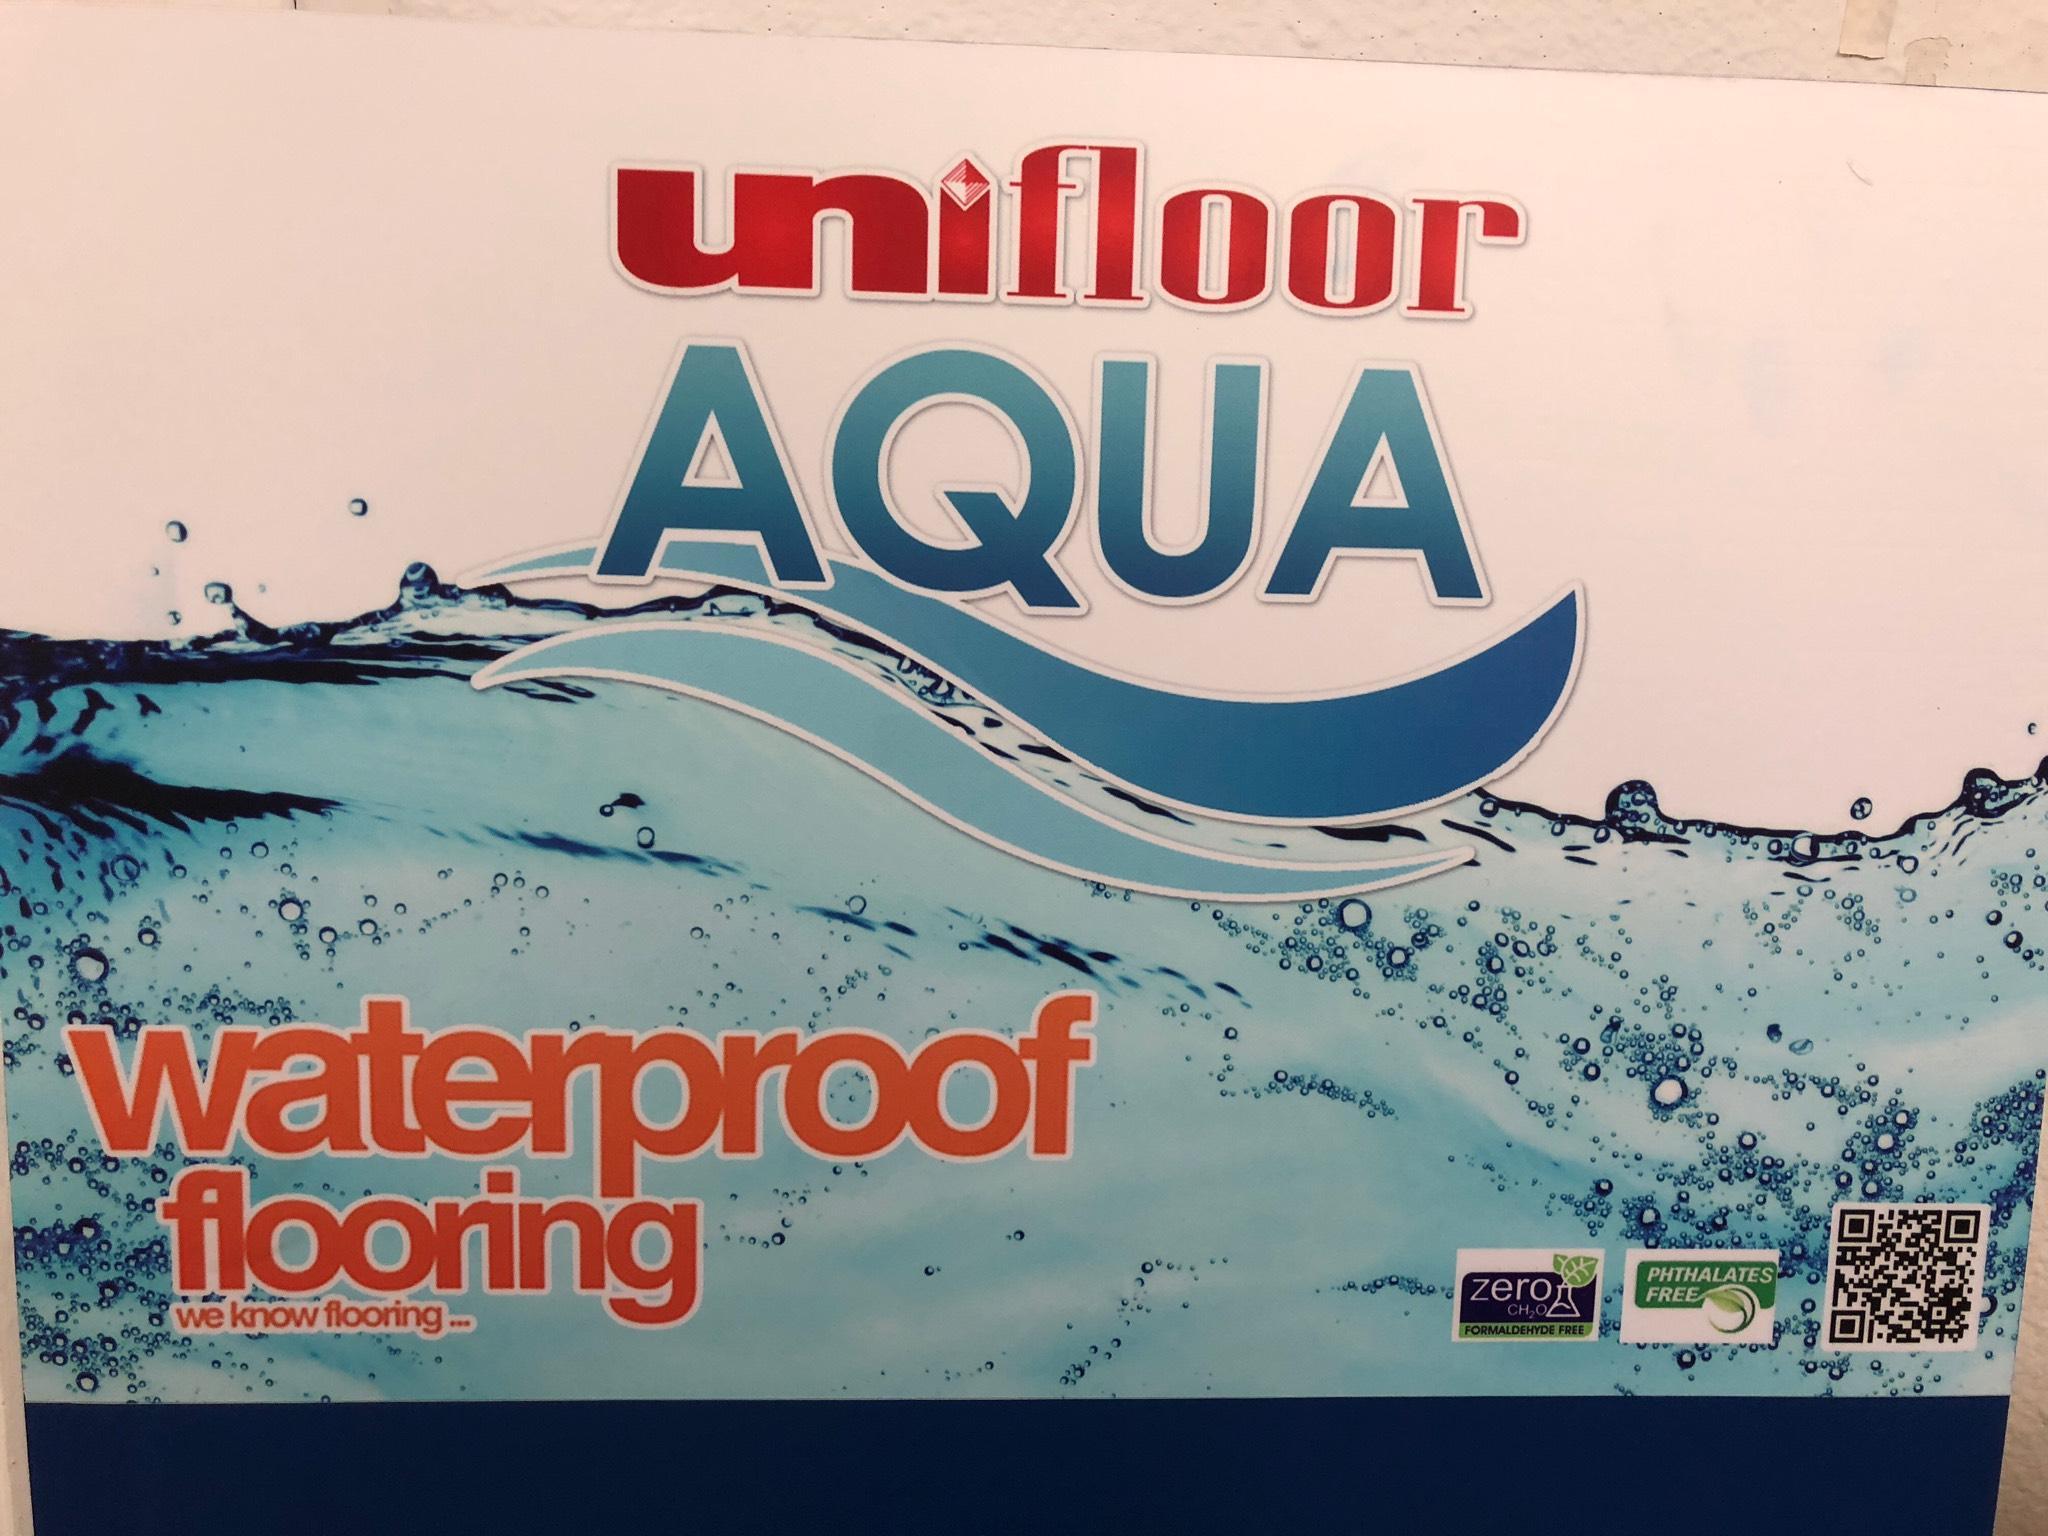 Unifloor Aqua distributor